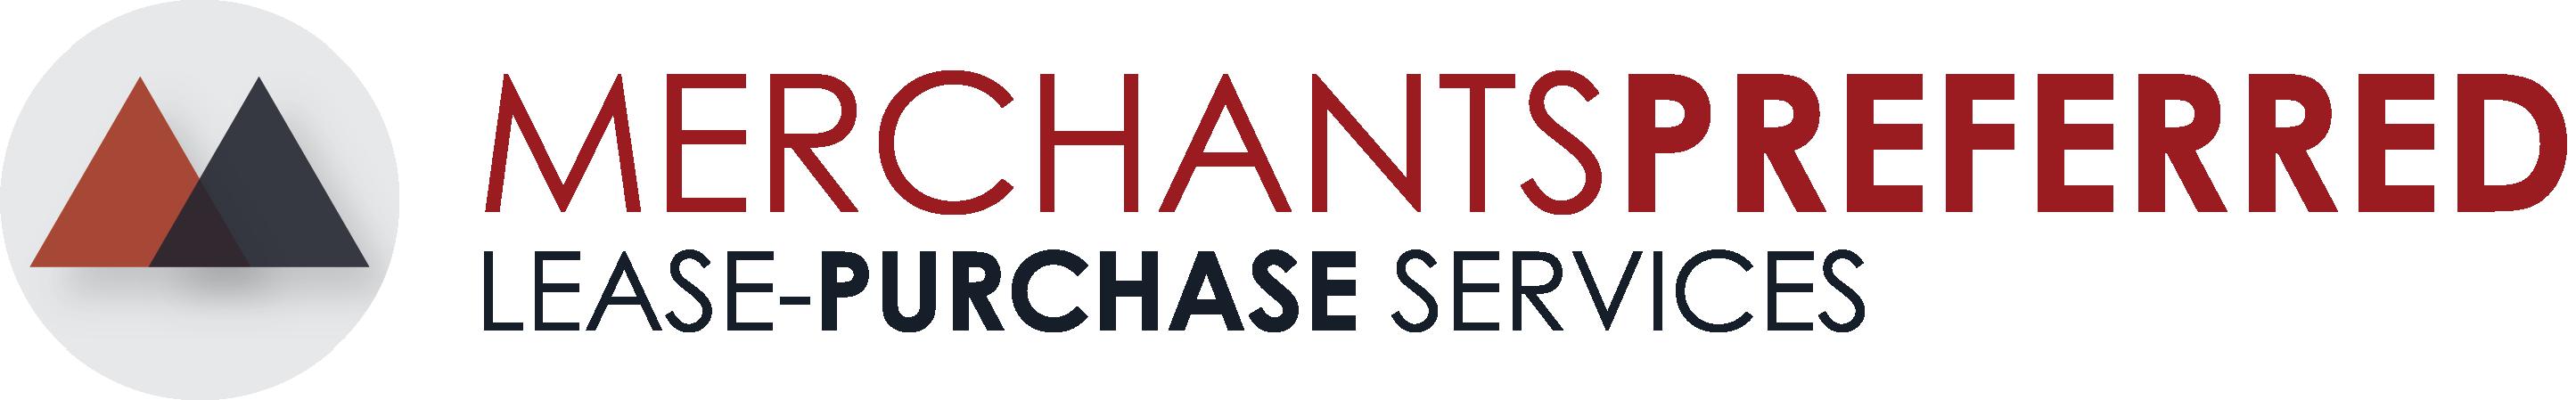 Merchants Preferred Lease-Purchase Services Logo